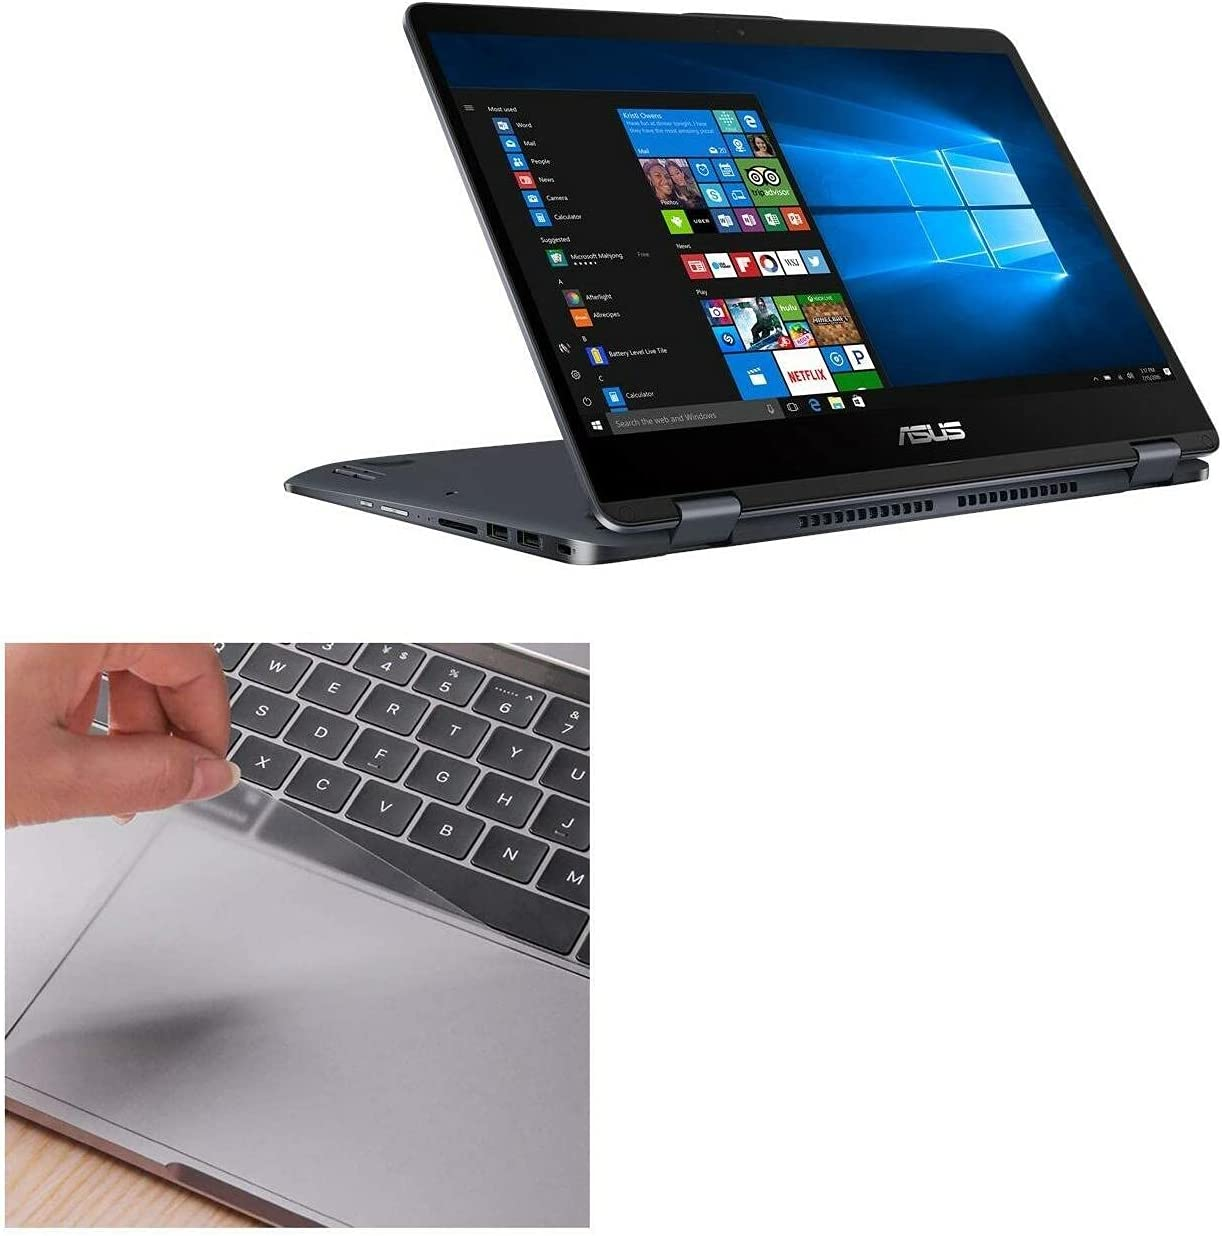 Max 81% OFF Touchpad Protector for ASUS Flip VivoBook 14 Atlanta Mall